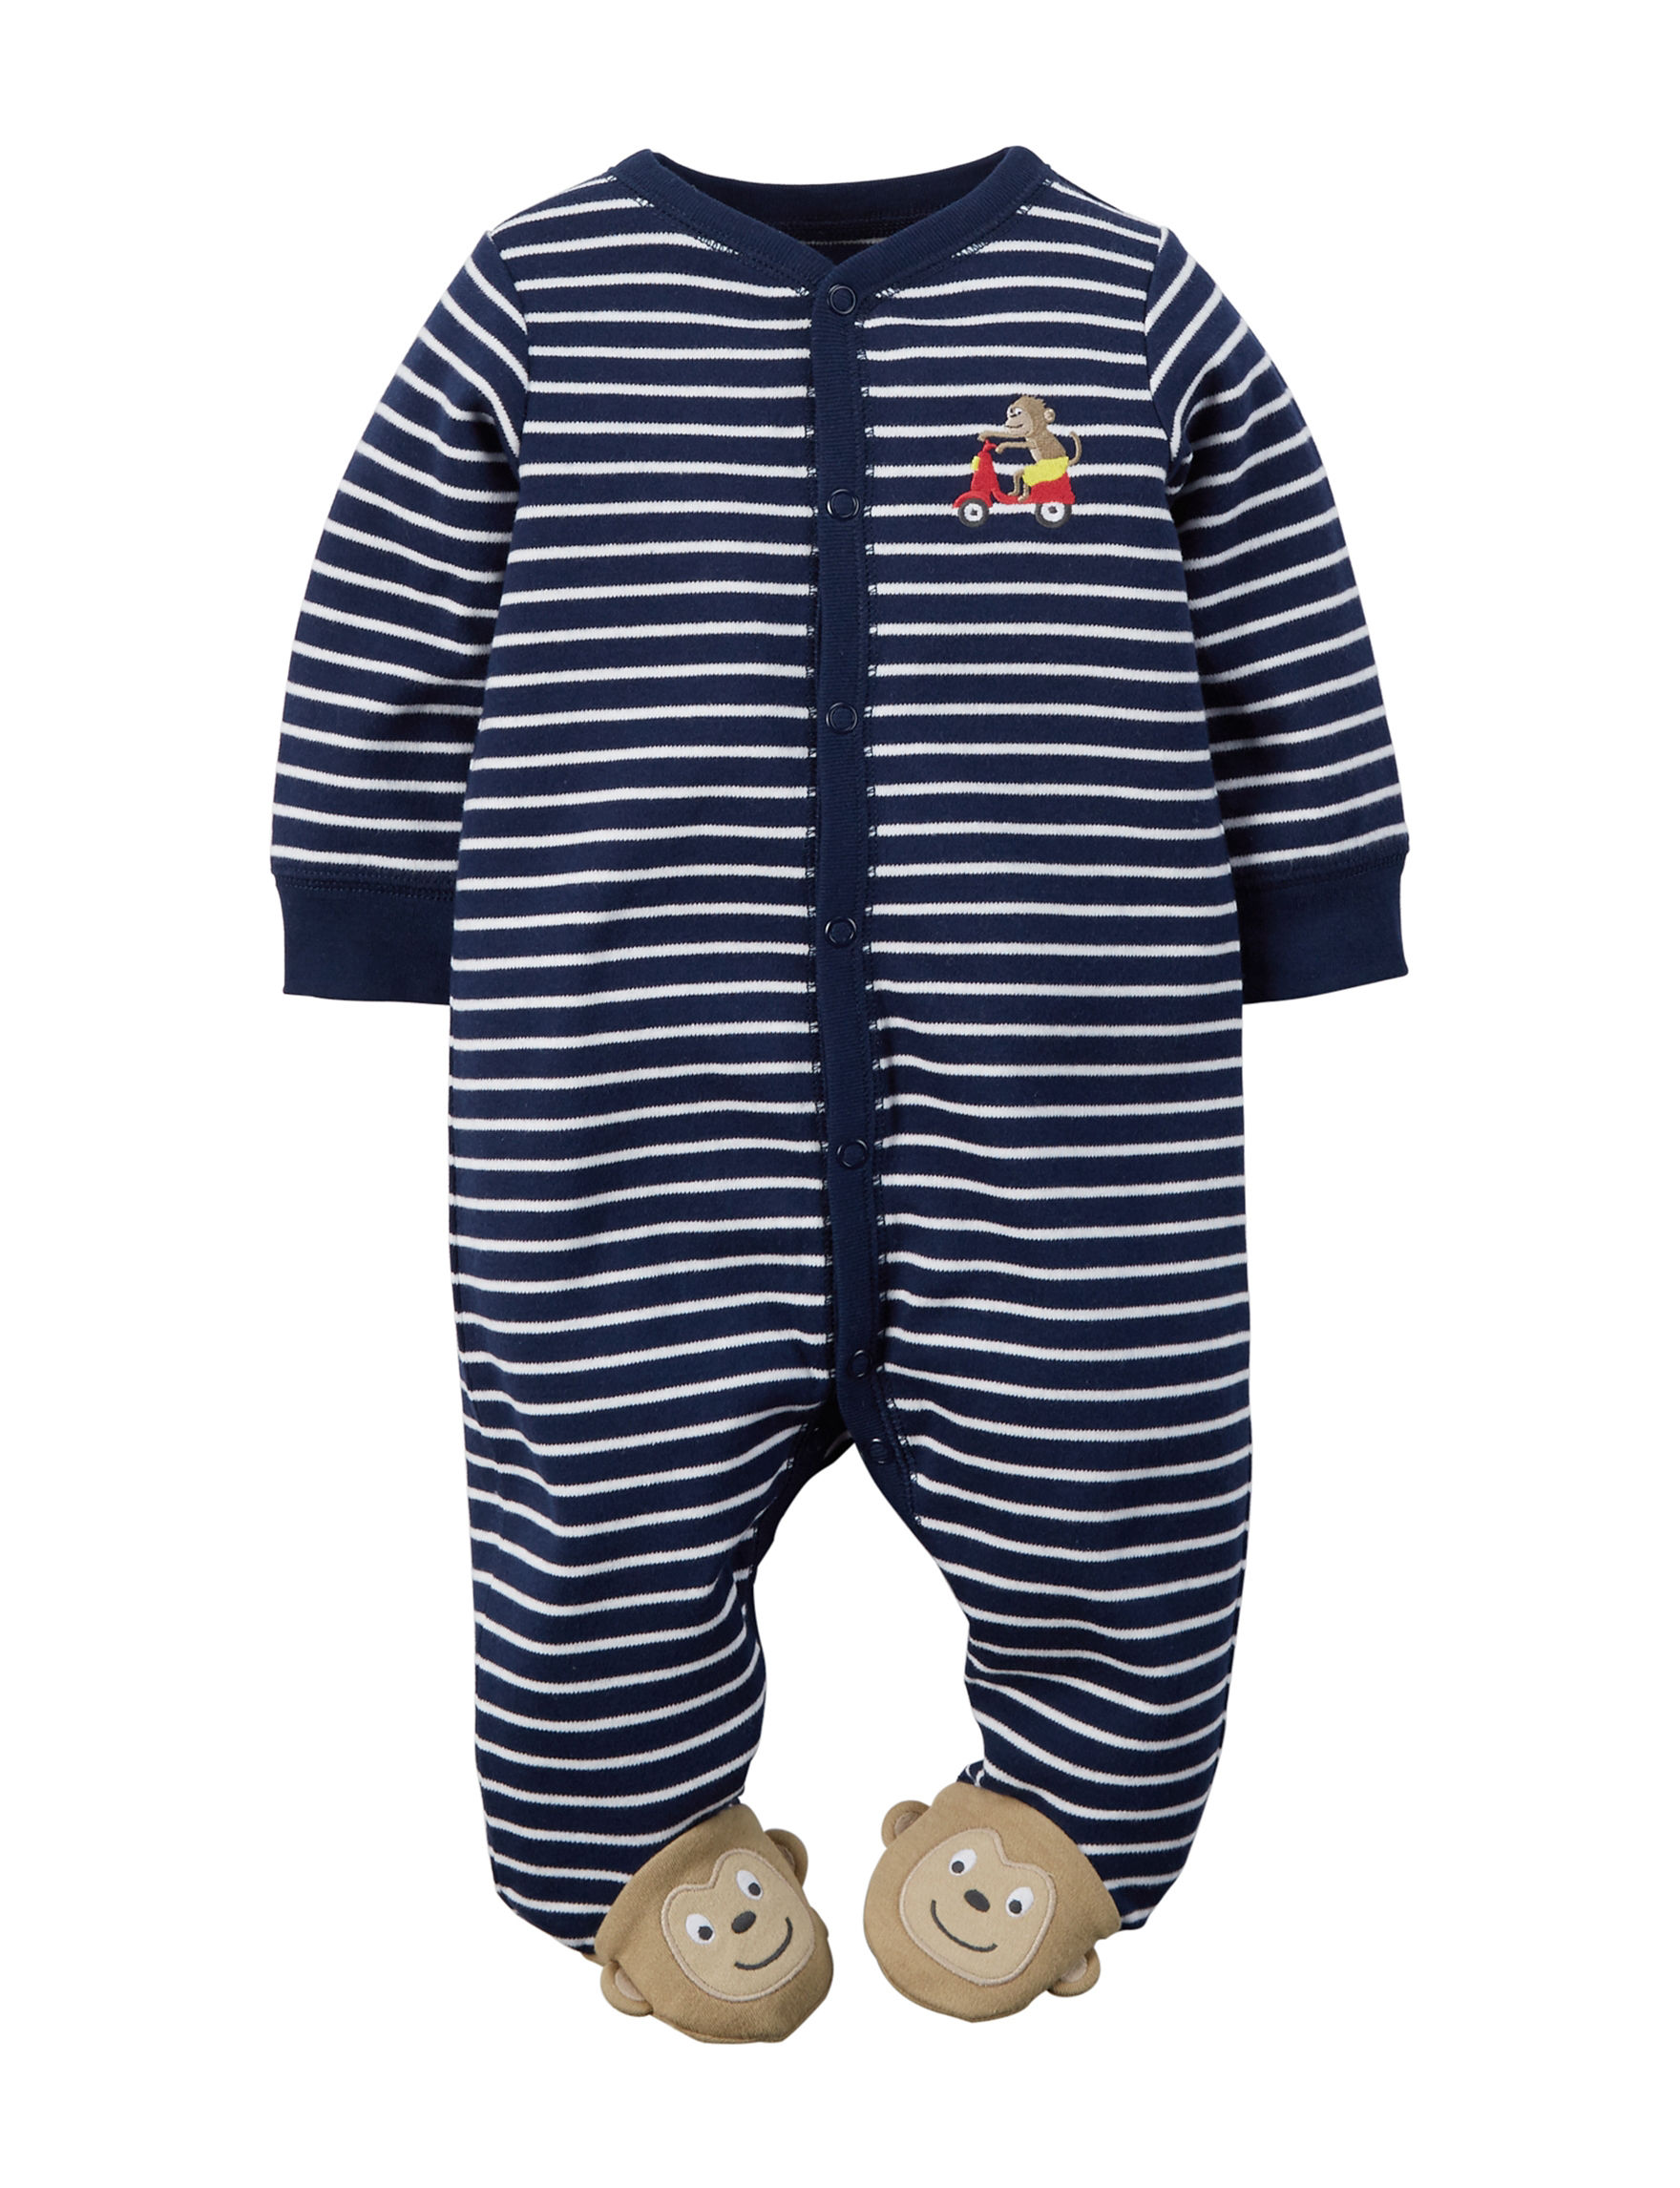 Carter's Navy